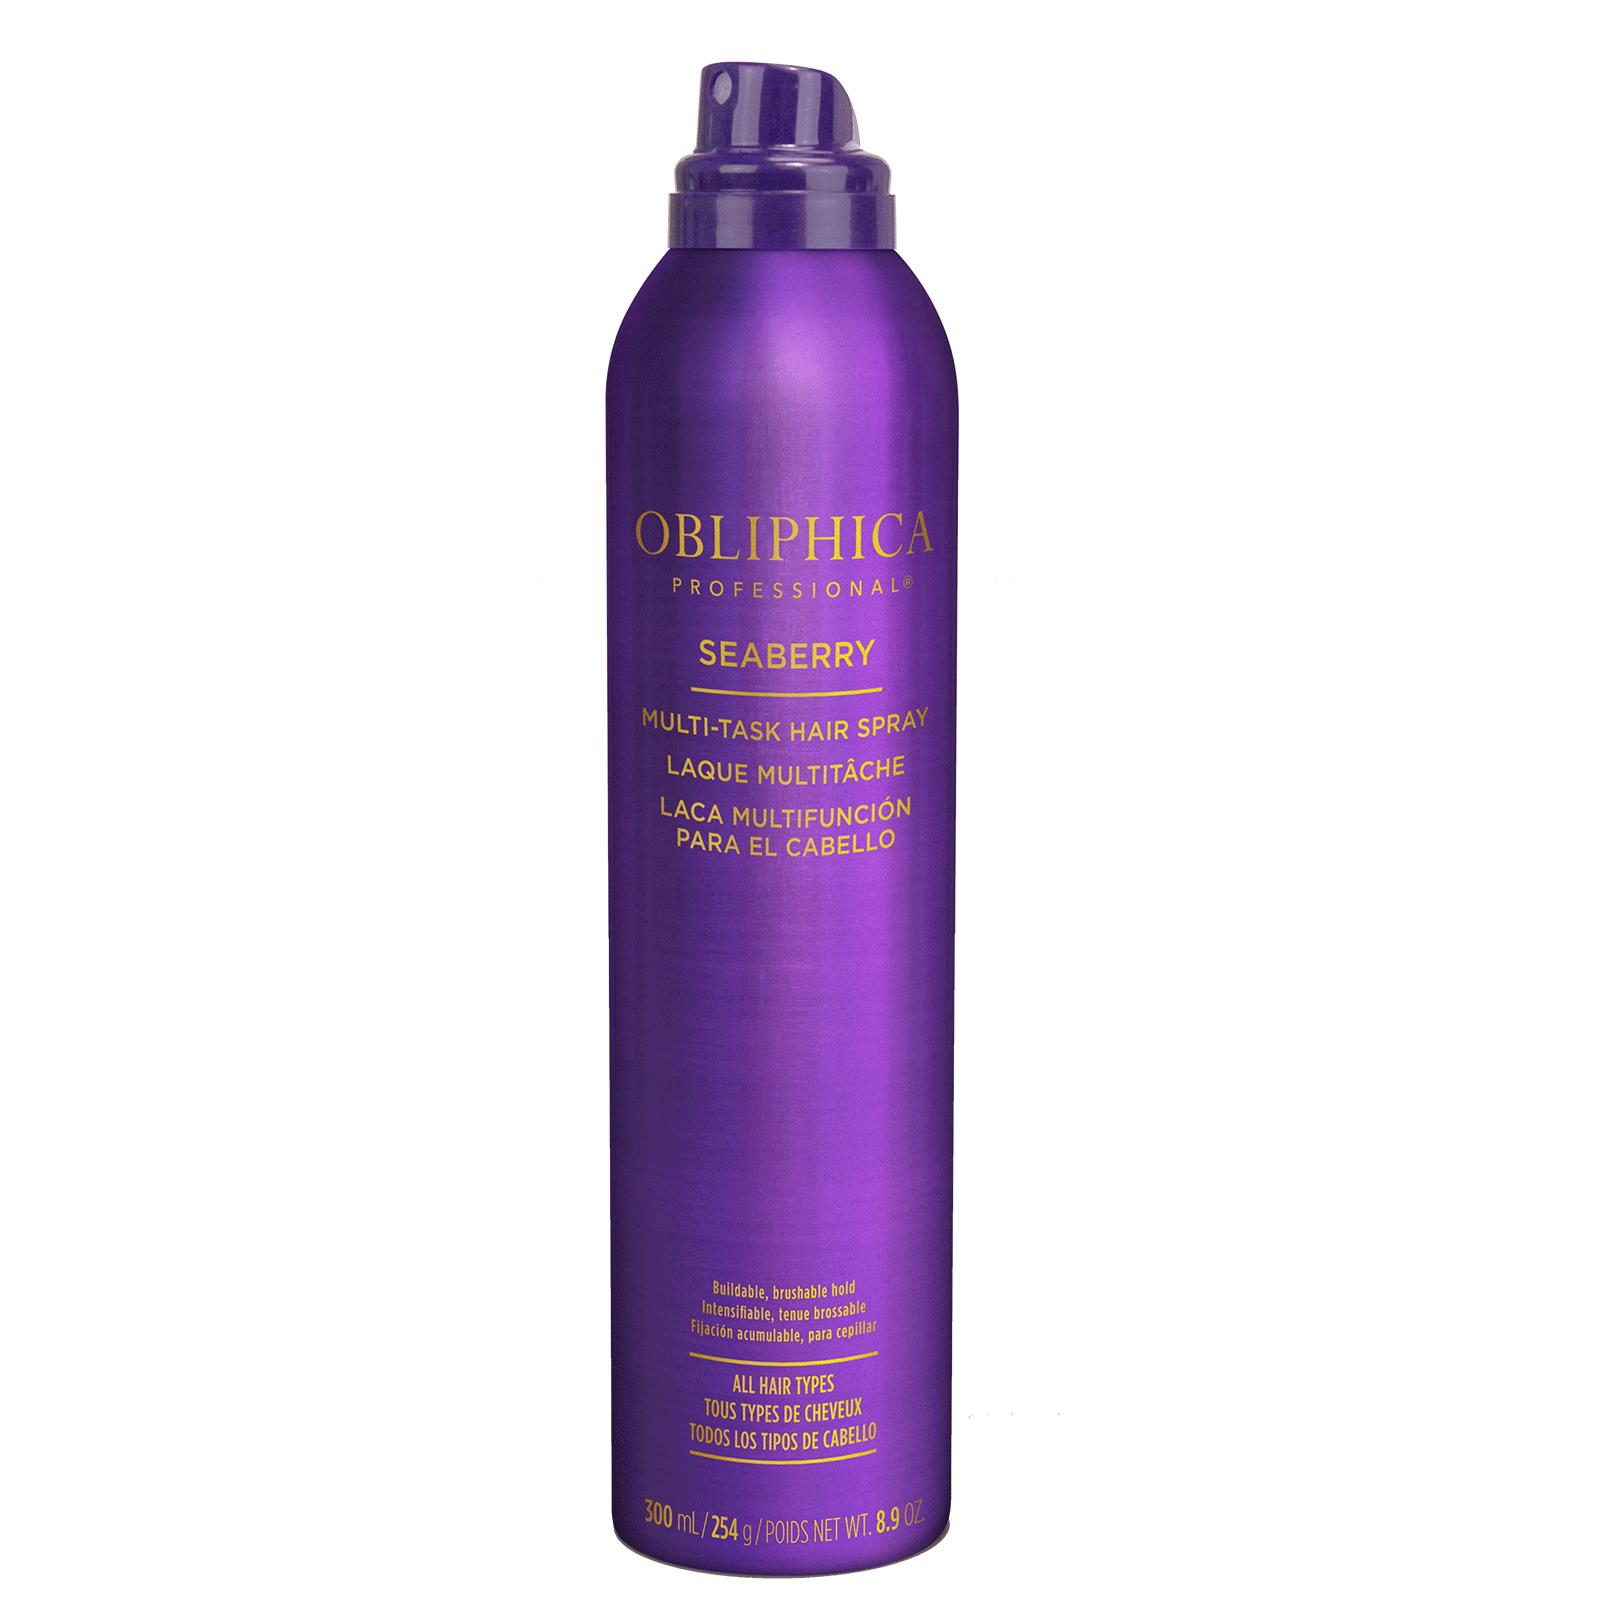 Seaberry multi task hairspray